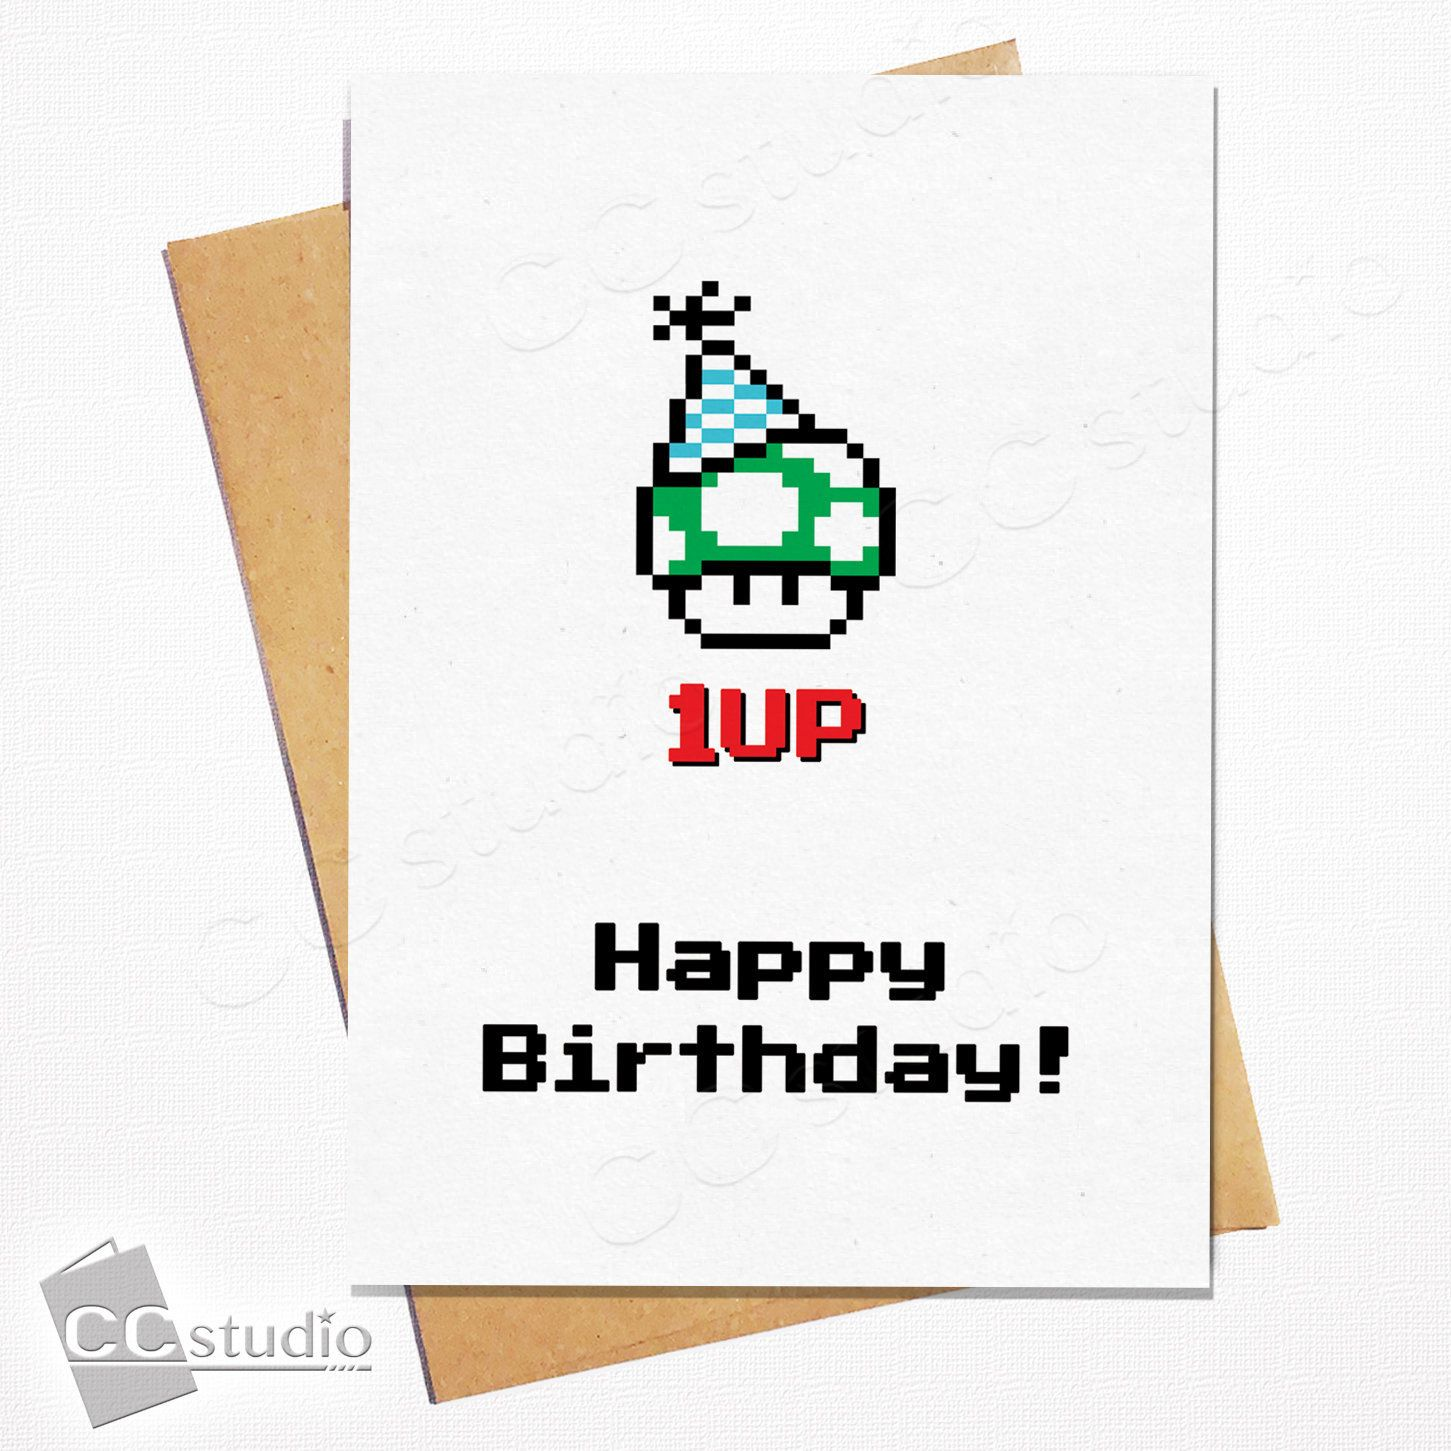 Nerdy Birthday Card Gamer Birthday Card Birthday Cards For Etsy In 2021 Happy Birthday Cards Printable Birthday Cards For Him Birthday Cards